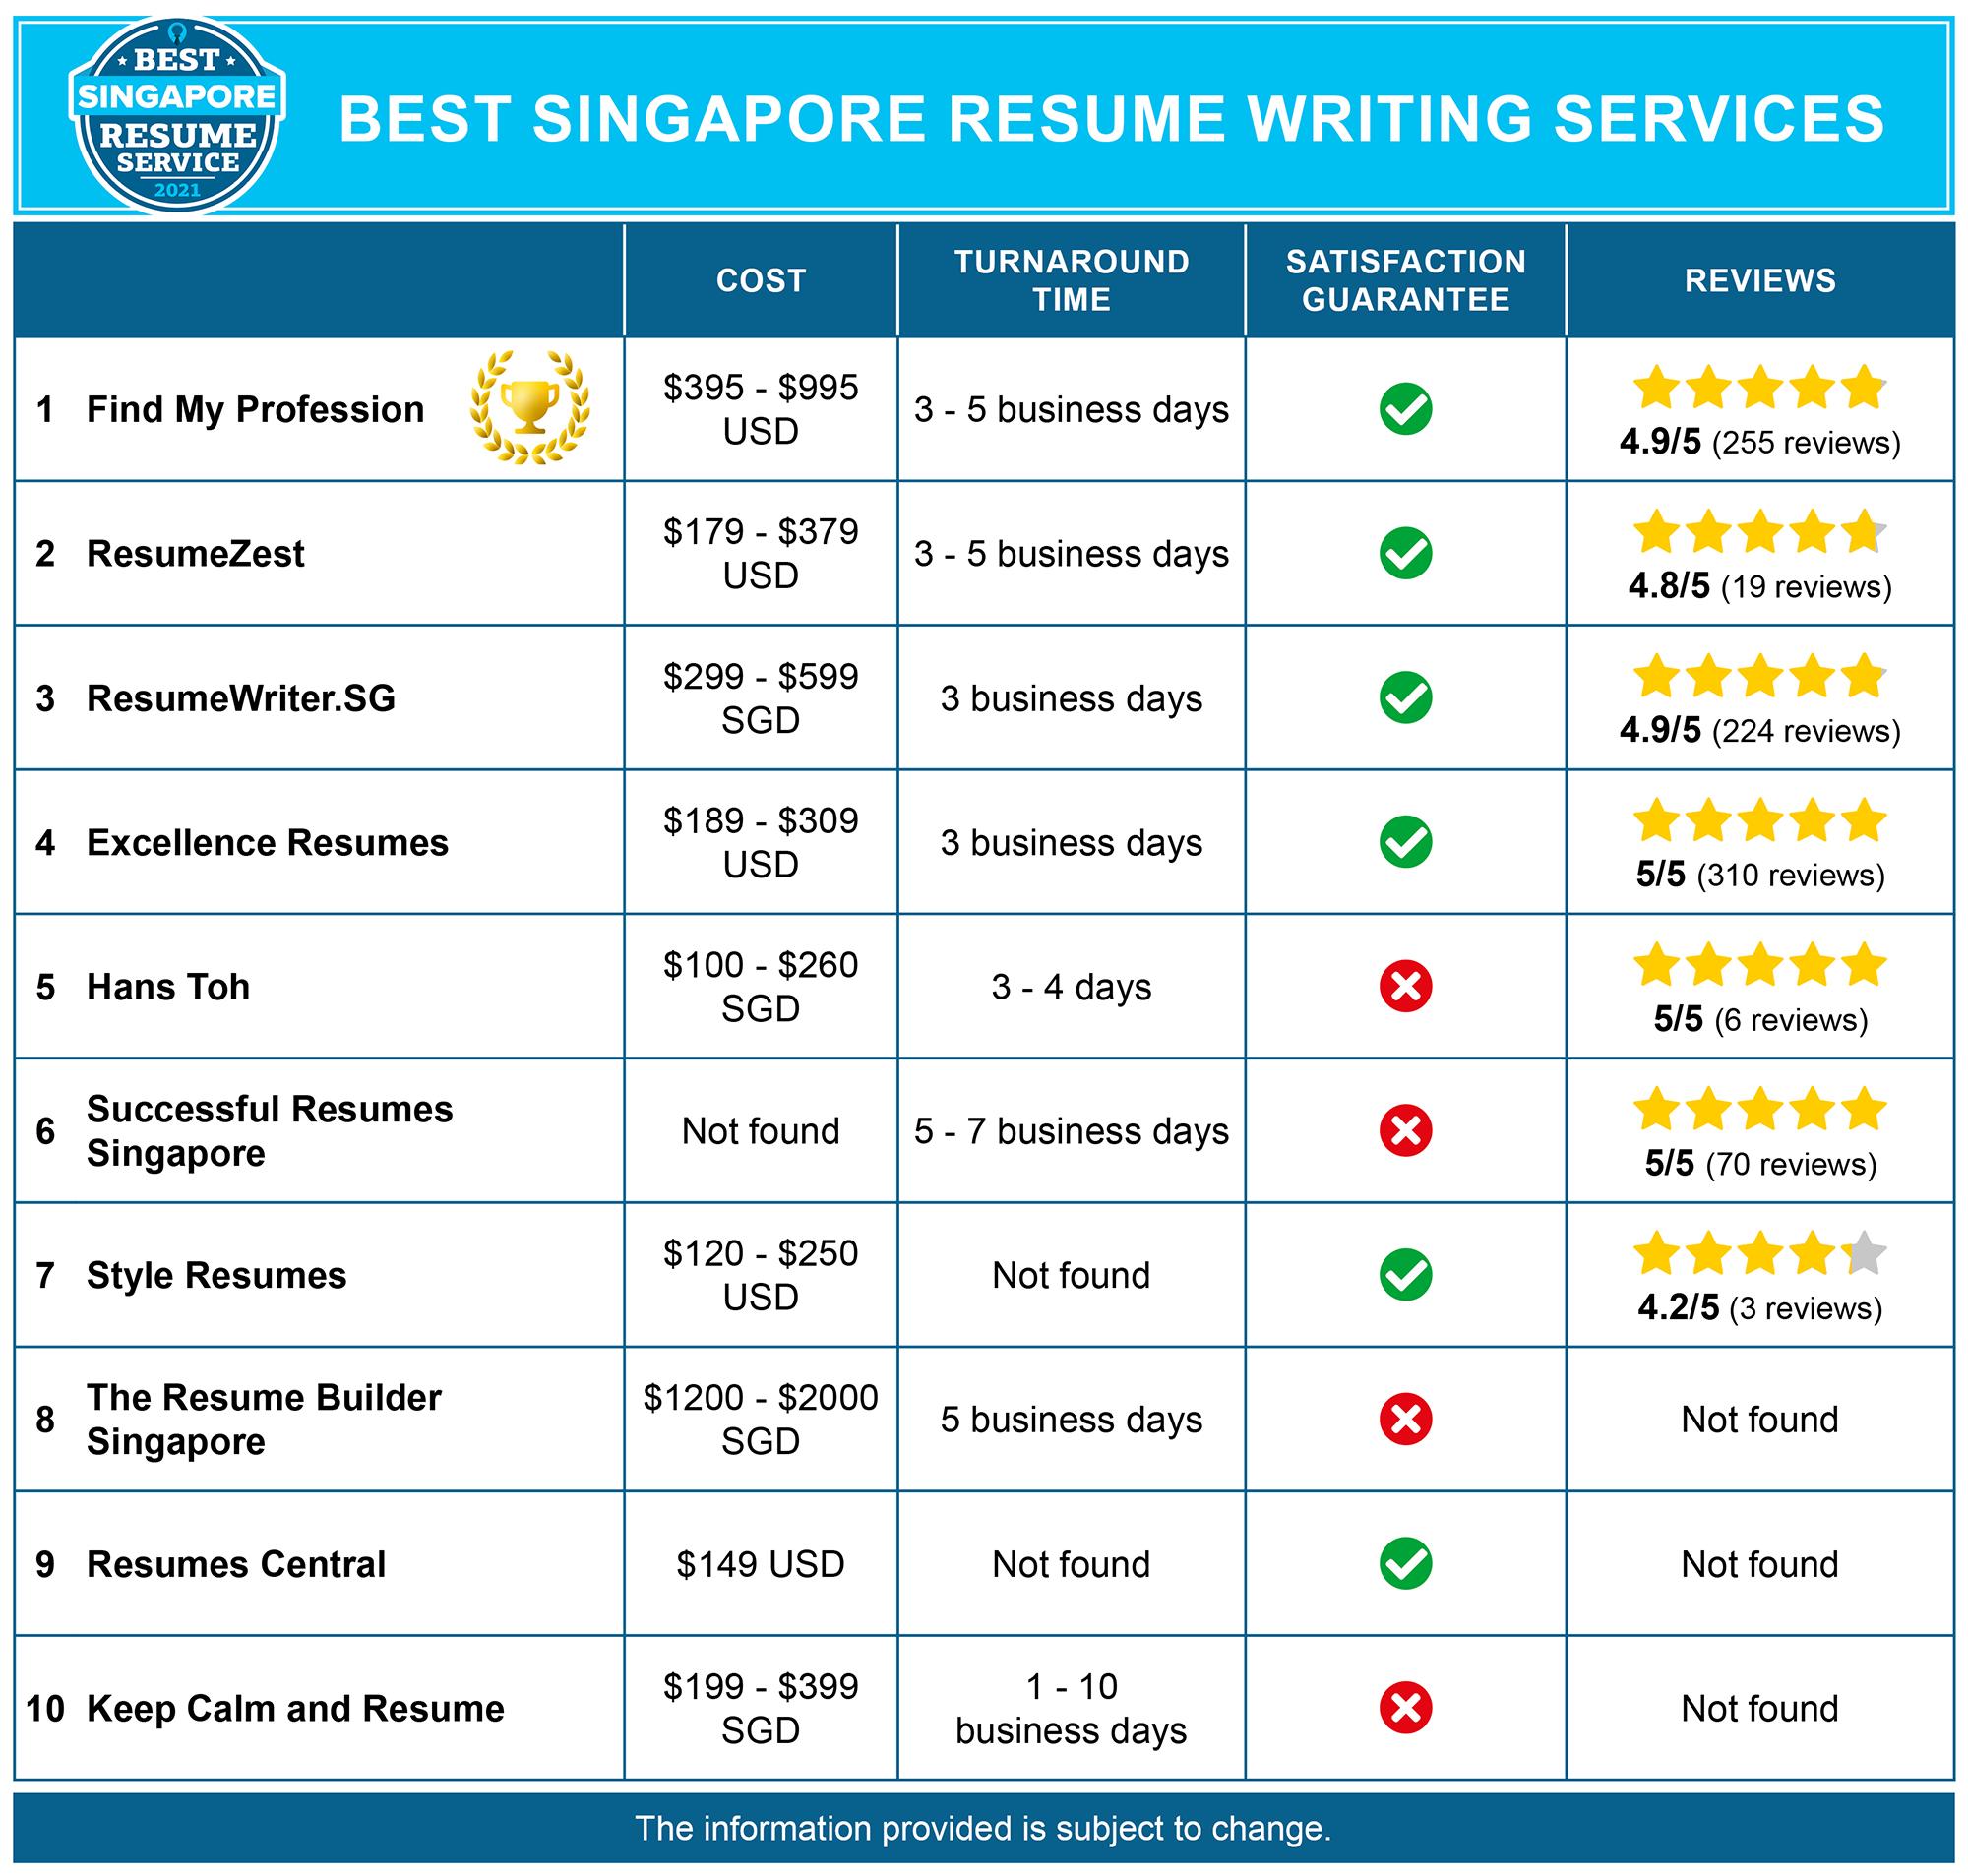 Best Singapore Resume Services